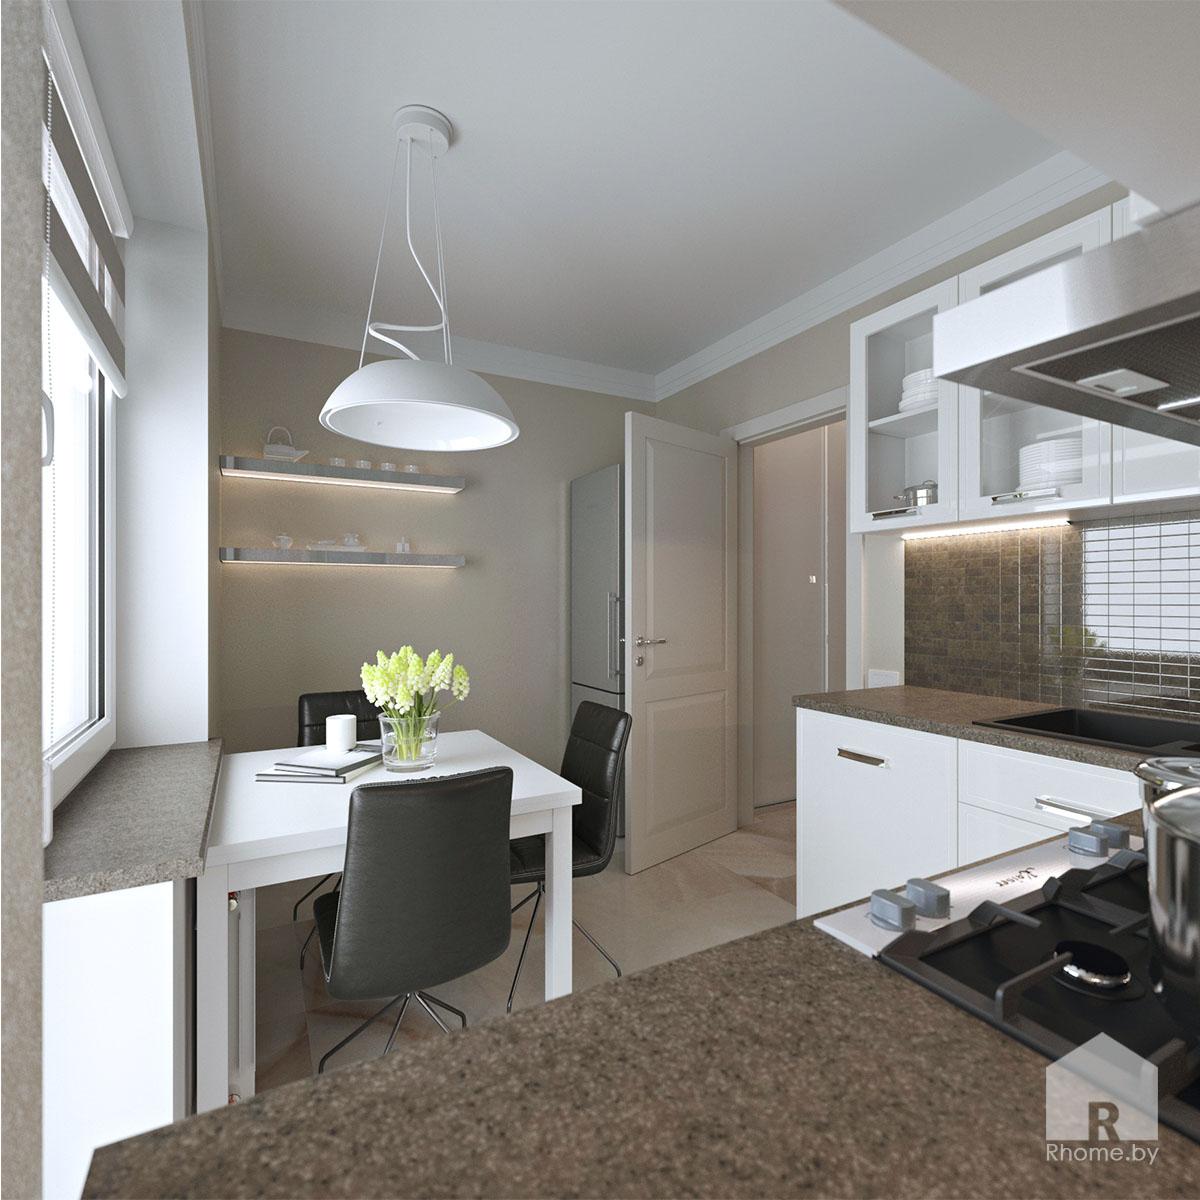 Дизайн интерьера кухни по ул. Белинского | Дизайн студия – Rhome.by